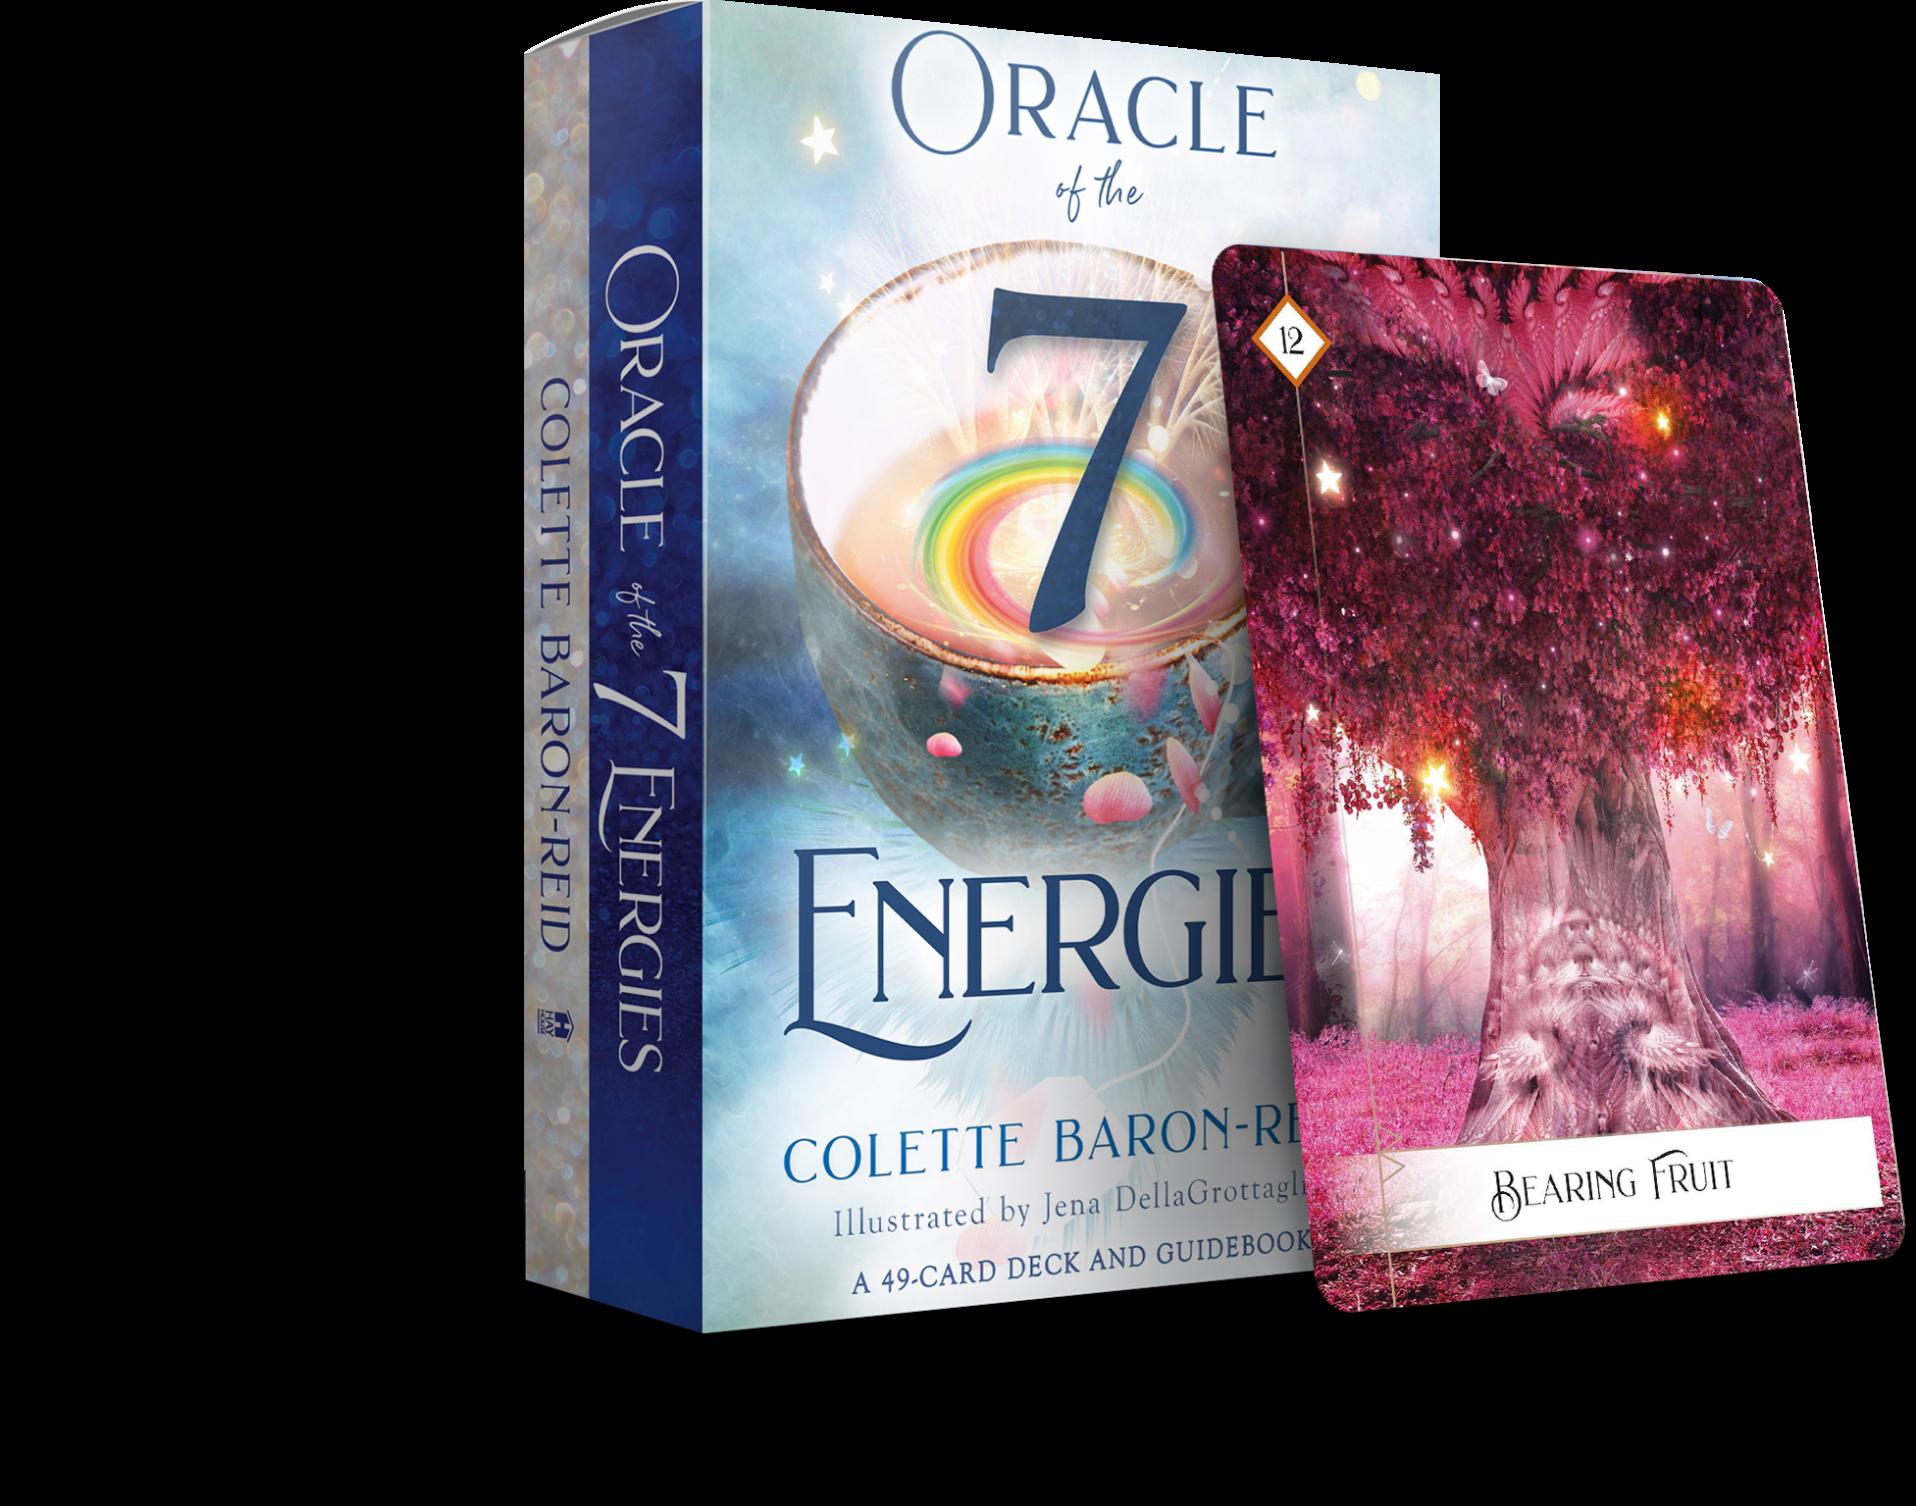 Oracle of the 7 energies_9781401956974_8